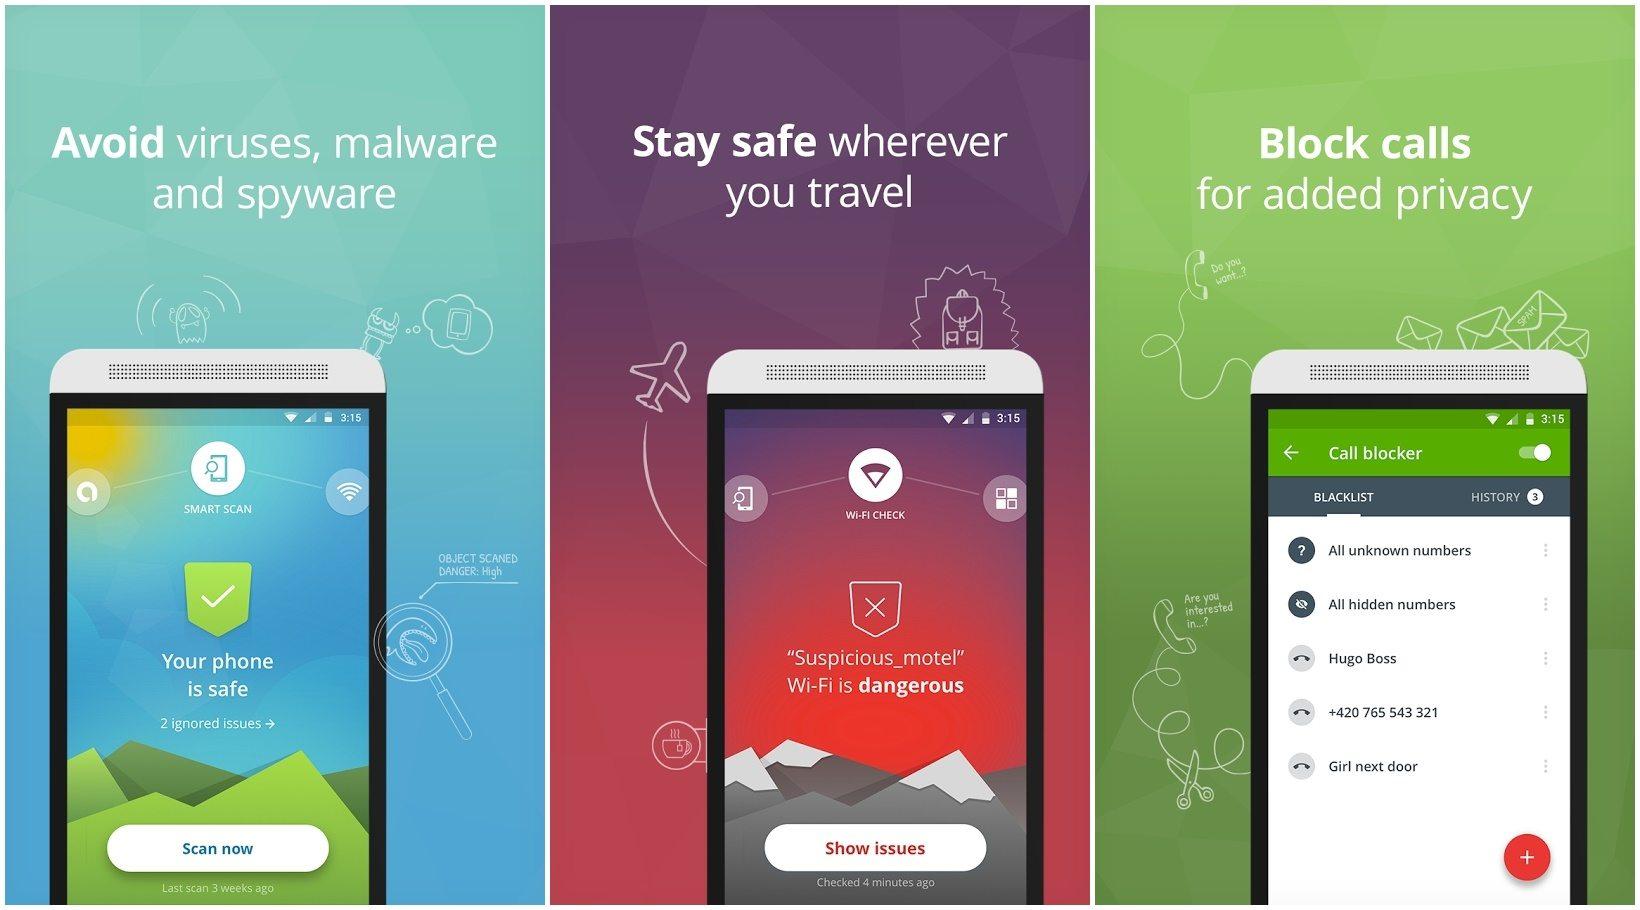 www.avast mobile antivirus.com